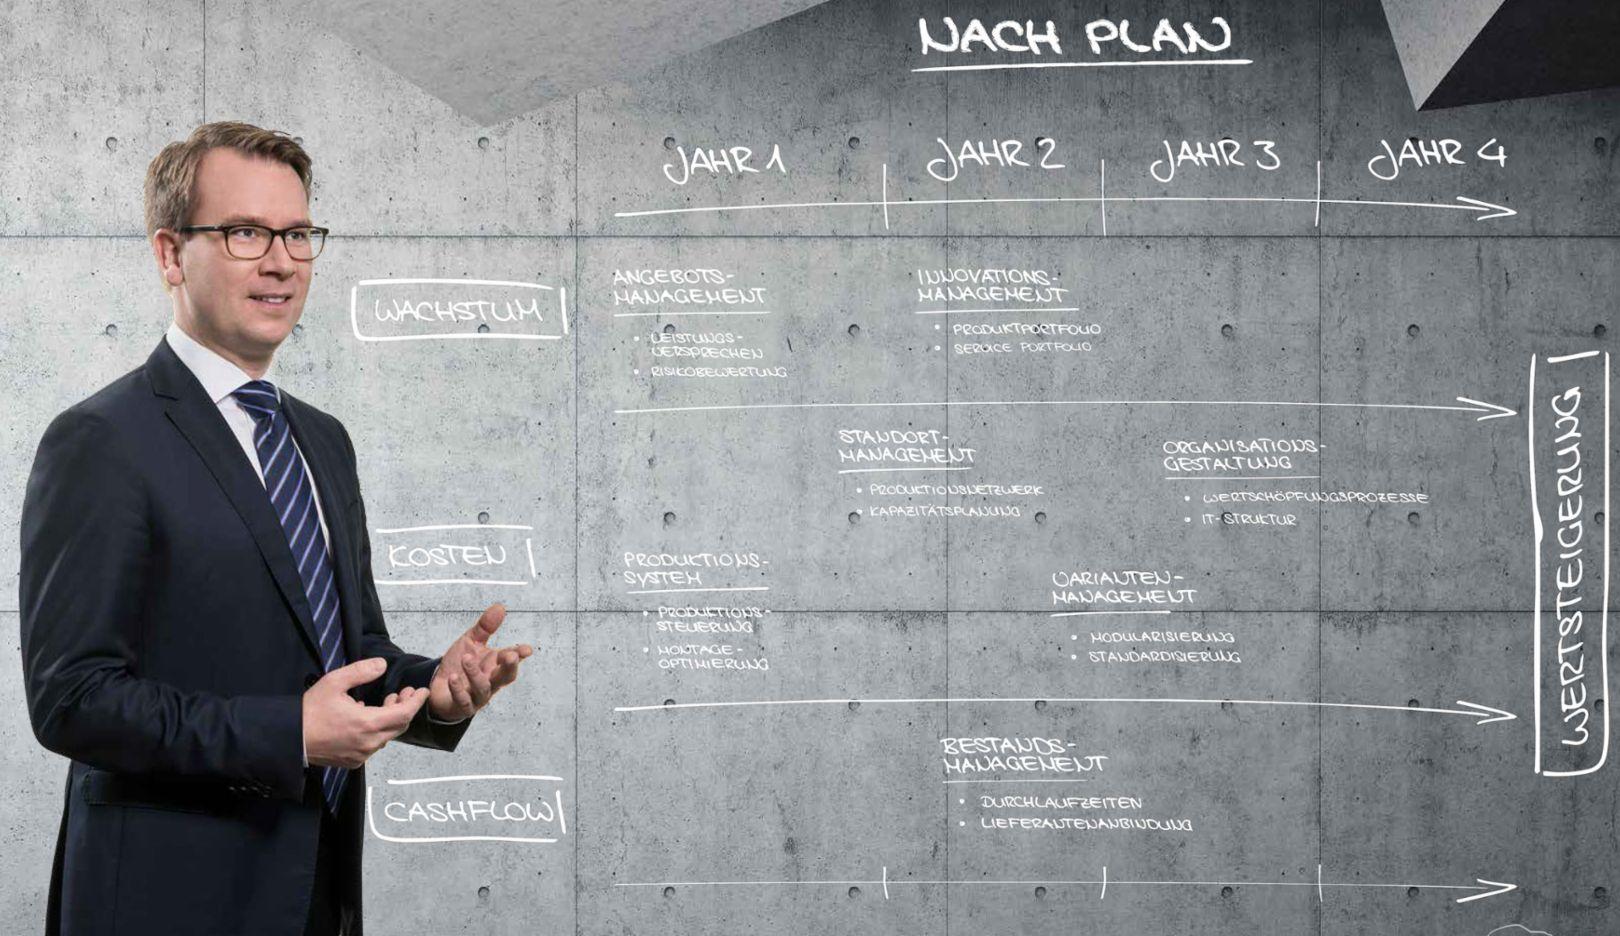 Sebastian Schöning, Chief Executive Officer, Maschinenbauunternehmen Gehring, 2016, Porsche Consulting GmbH